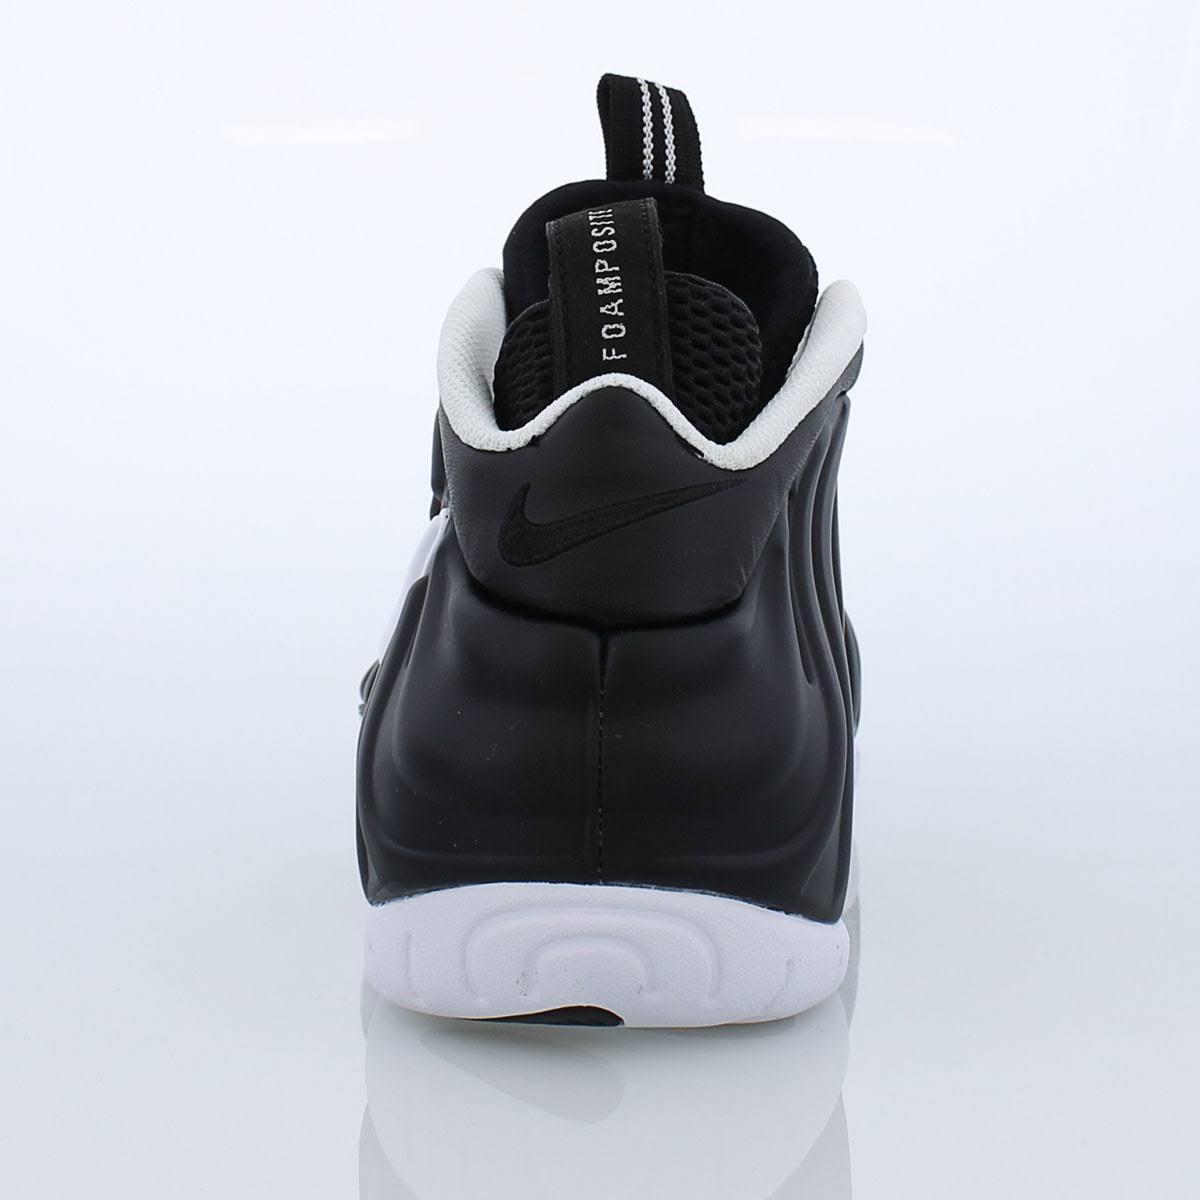 Schwarz Basketballschuhe 624041006 Nike Weiß Herren Foamposite Air 5 Größe Pro 7 ICRqAzw